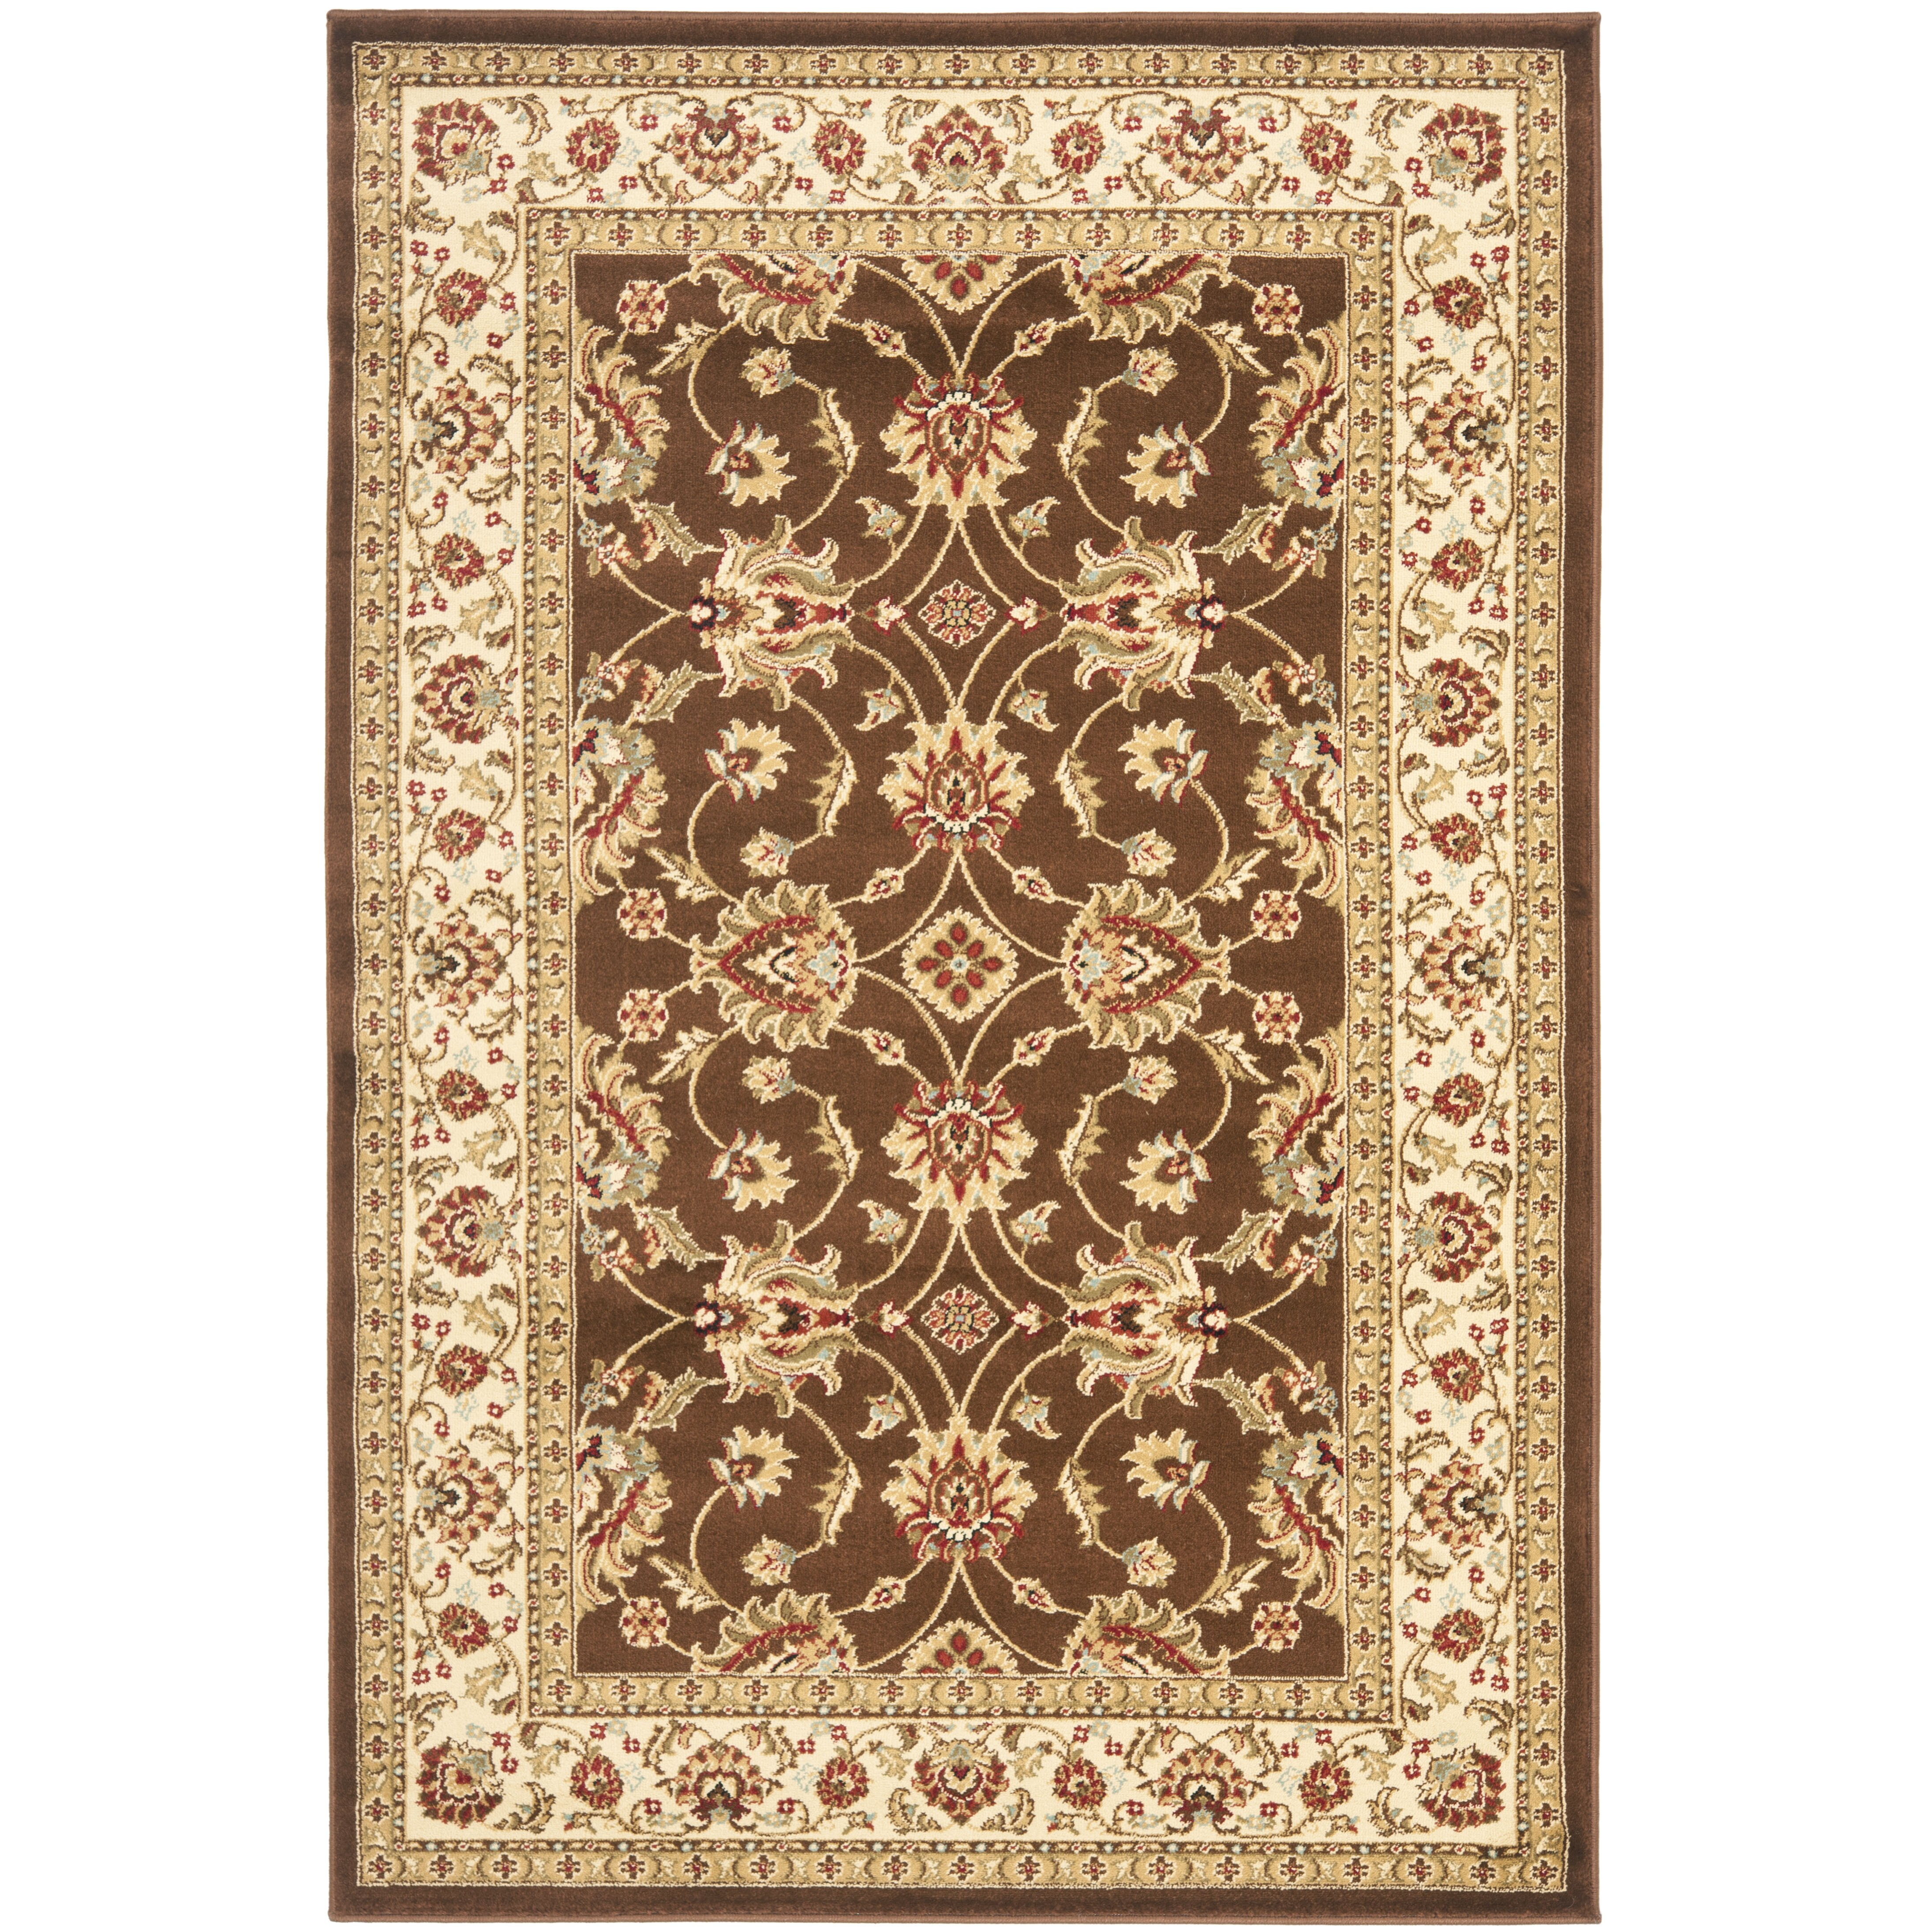 Area Rug Persian 9x12 Oriental Carpet Ivory Wool: Safavieh Lyndhurst Brown/Ivory Persian Area Rug & Reviews